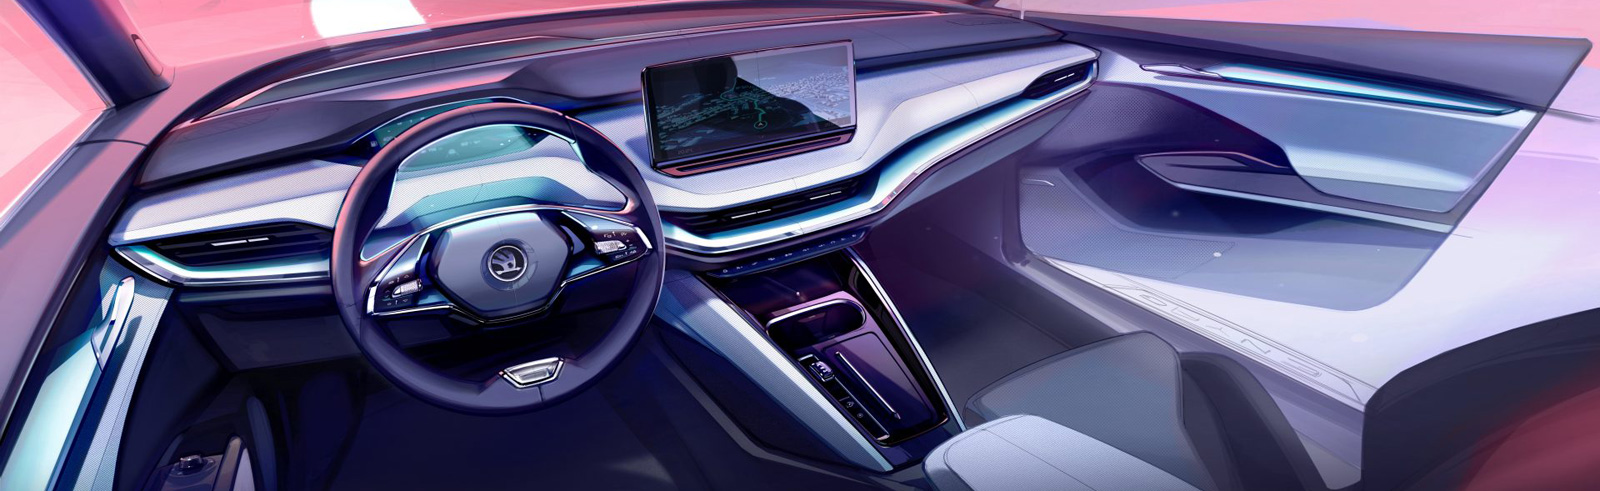 Škoda shows off the ENYAQ iV interior